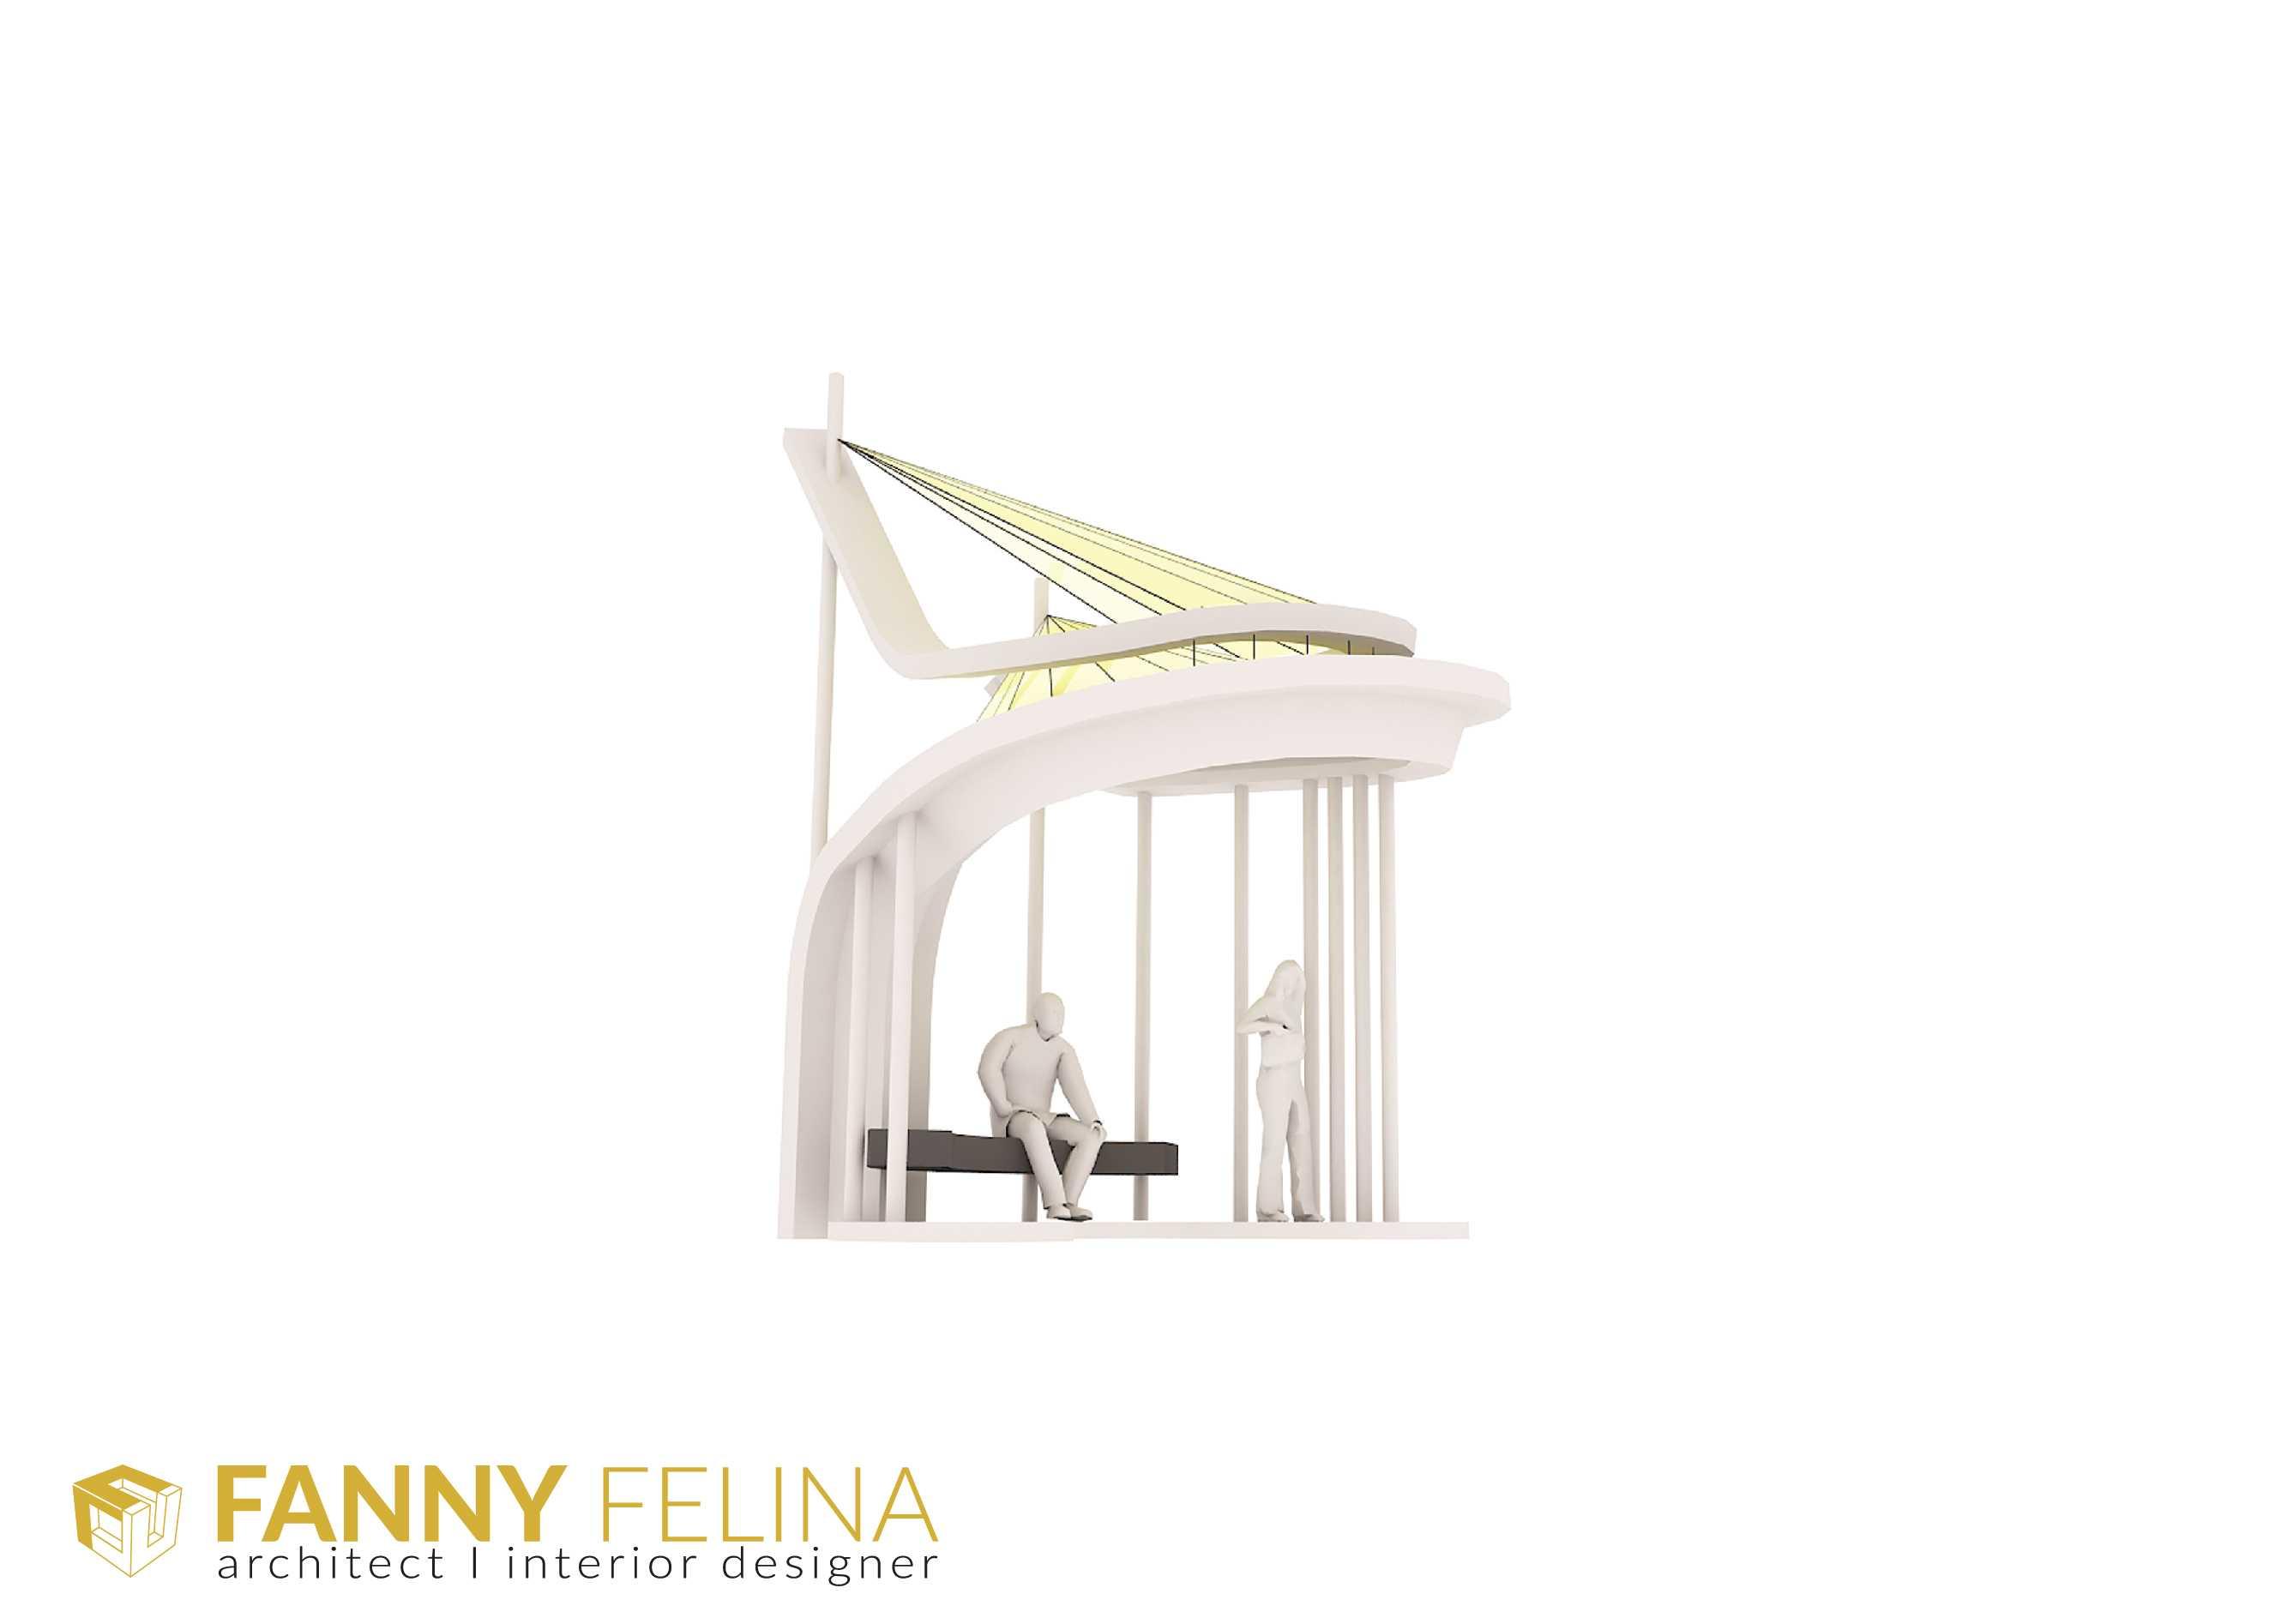 Fanny Felina Architecture & Interior Design P Shelter Surabaya, Surabaya City, East Java, Indonesia Surabaya, Surabaya City, East Java, Indonesia 05 Kontemporer,modern  35319